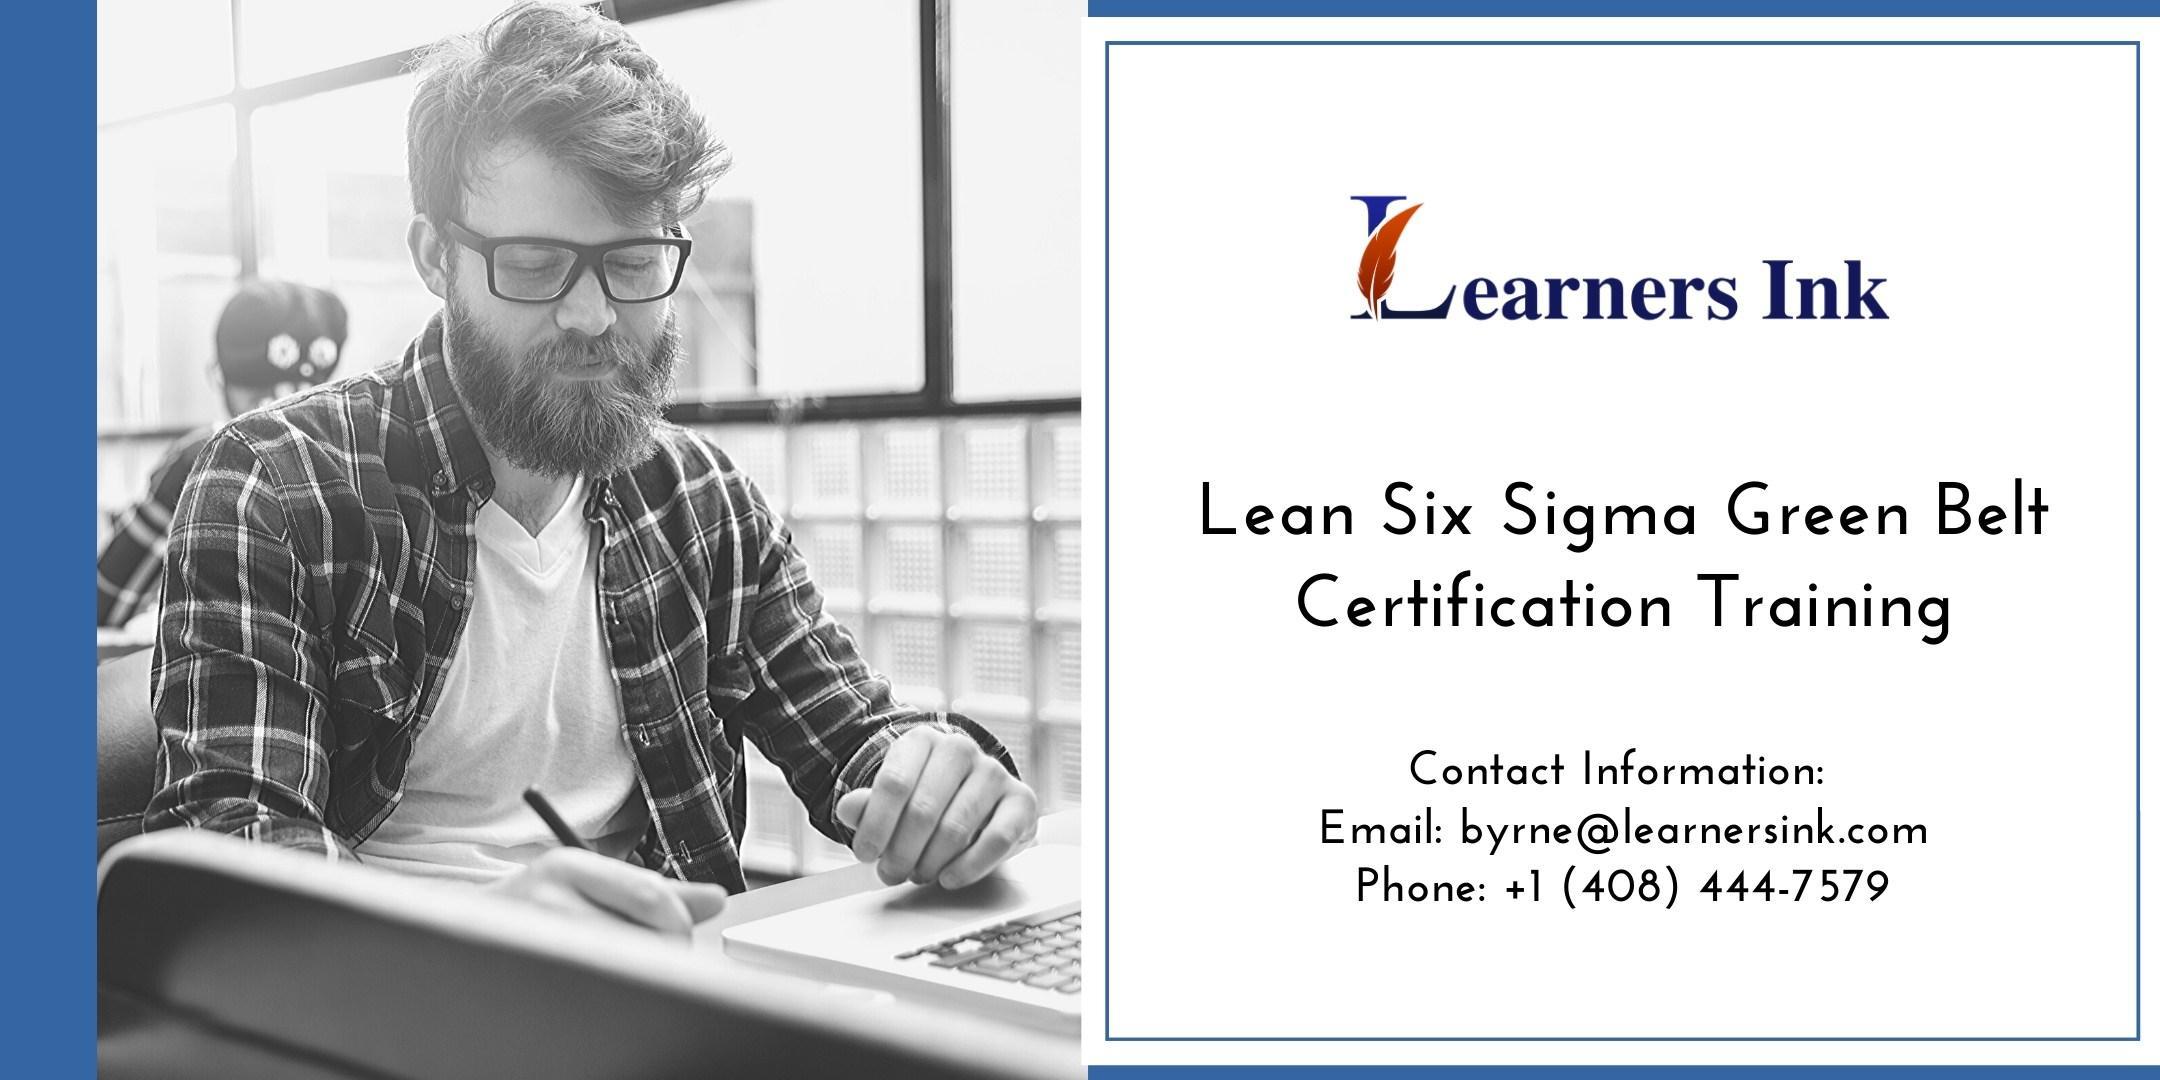 Lean Six Sigma Green Belt Certification Training Course (LSSGB) in McAllen